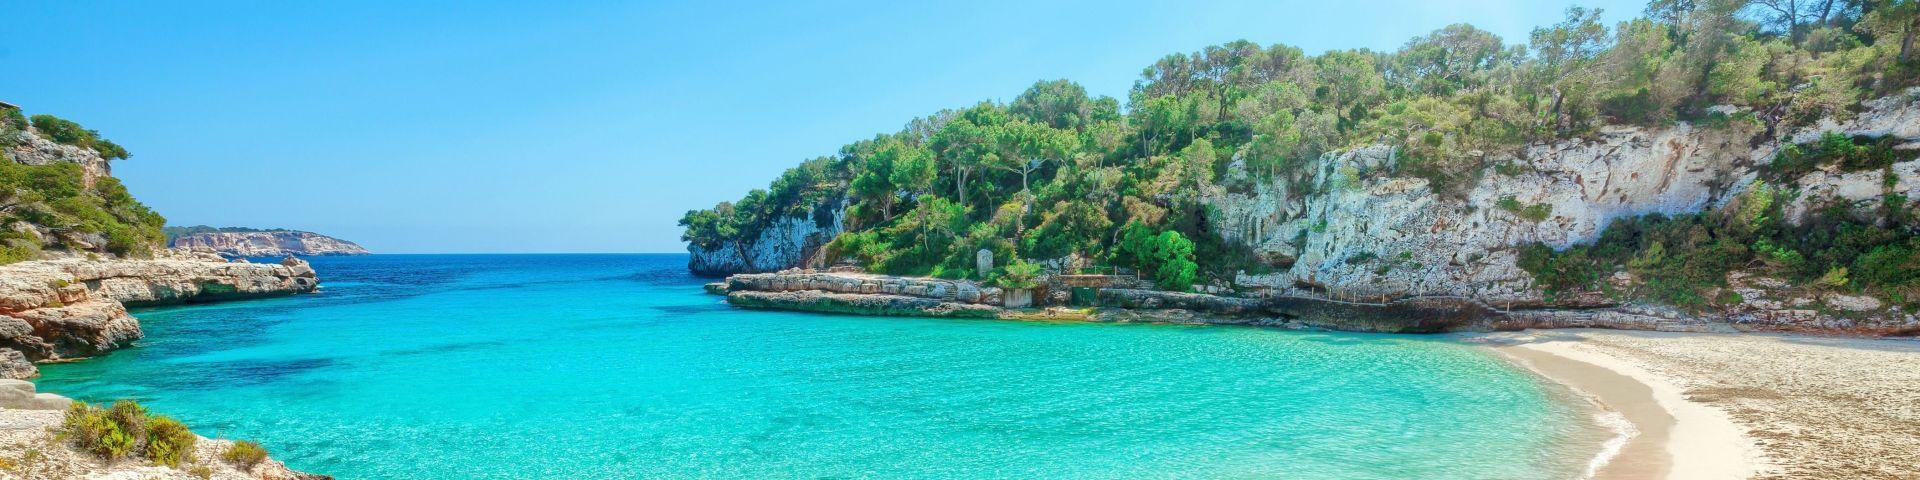 Mallorca Urlaub ohne Quarantäne!